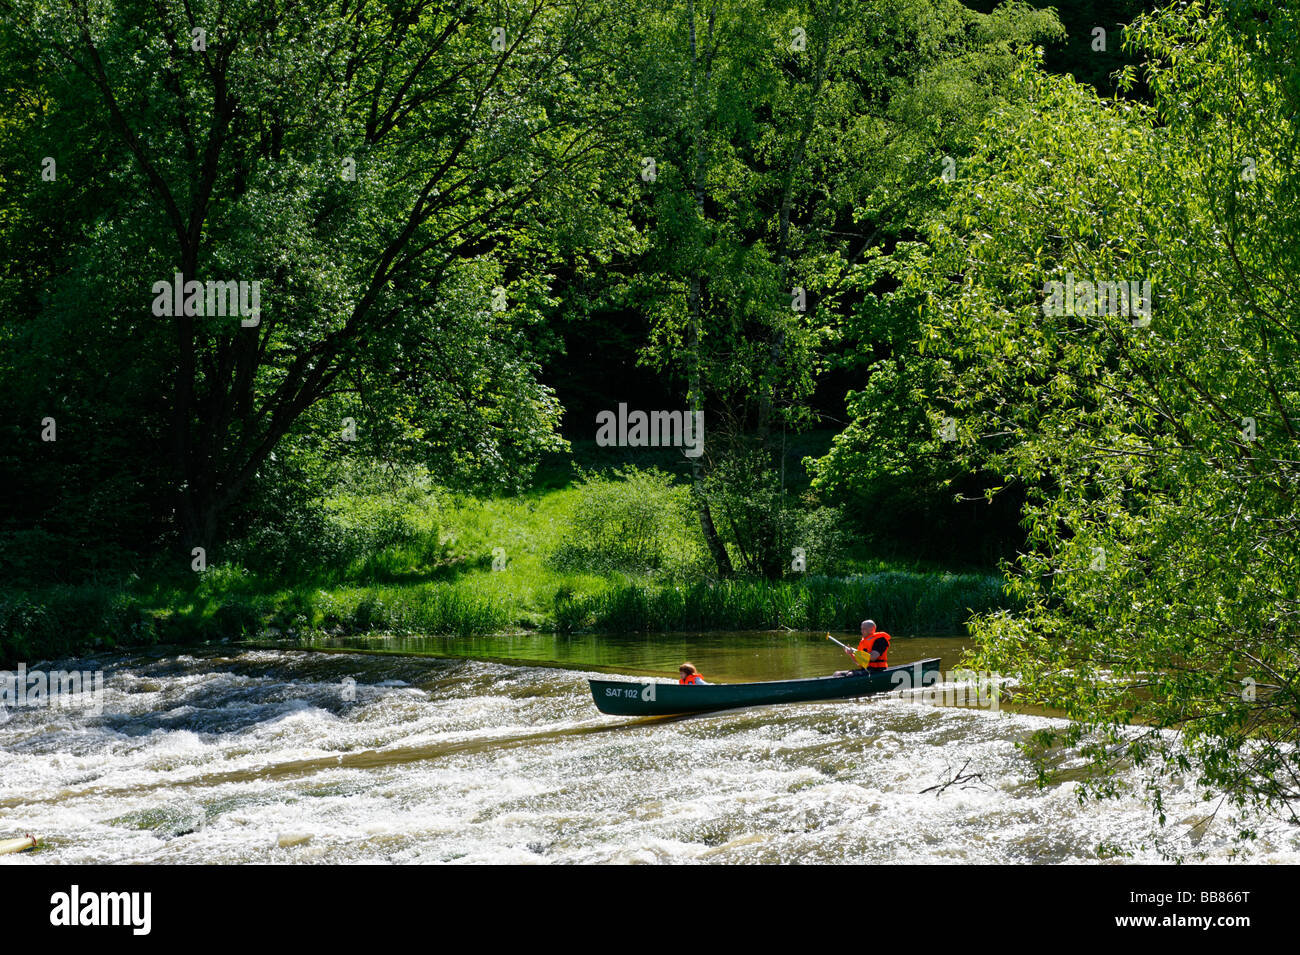 Tour de canoa, viaje en canoa, cerca del valle de Altmuehltal Dollnstein, Alta Baviera, Alemania, Europa Imagen De Stock